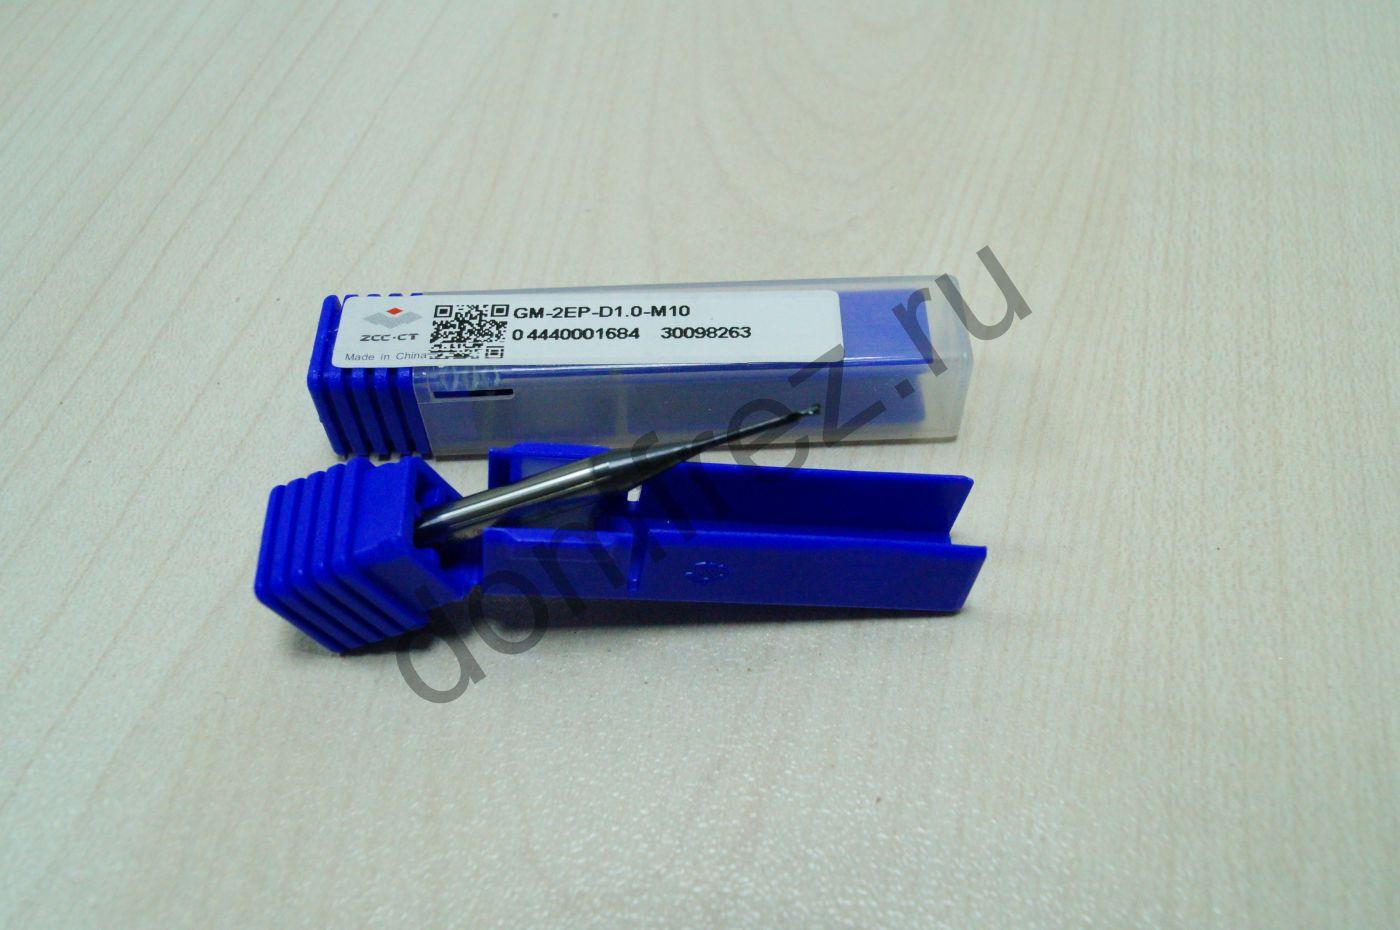 Фреза GM-2EP-D1.0-M10